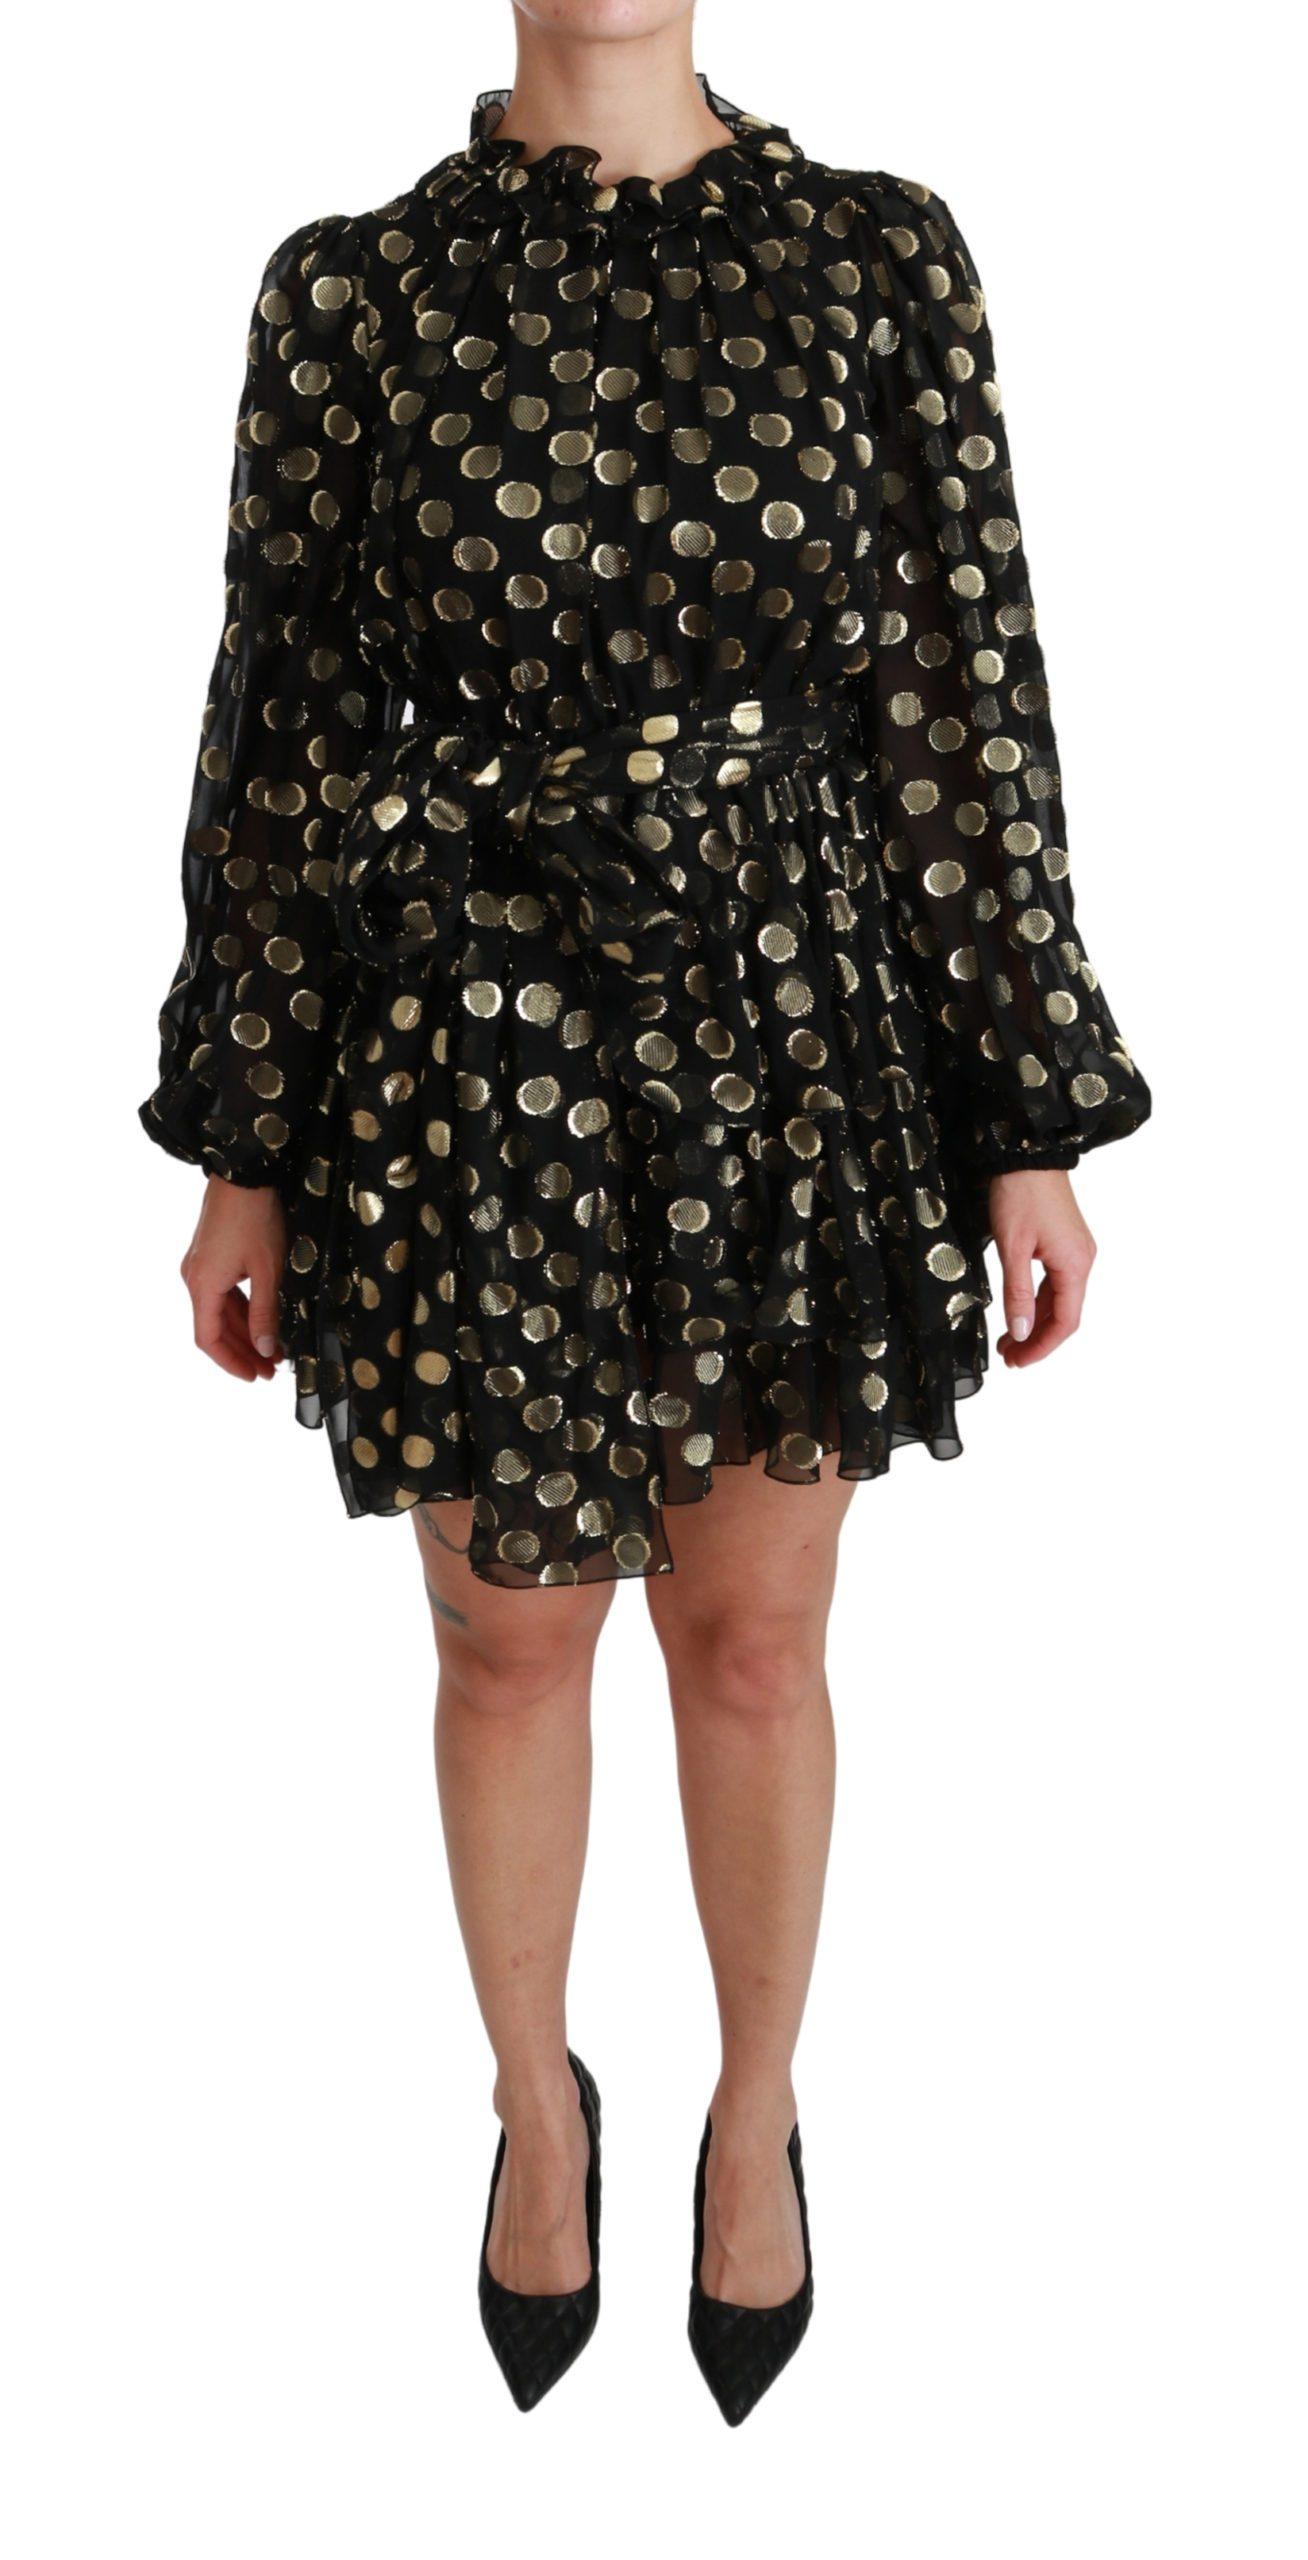 Dolce & Gabbana Women's Lurex Polka Silk Flared Dress Gold Black DR2492 - IT36   XS